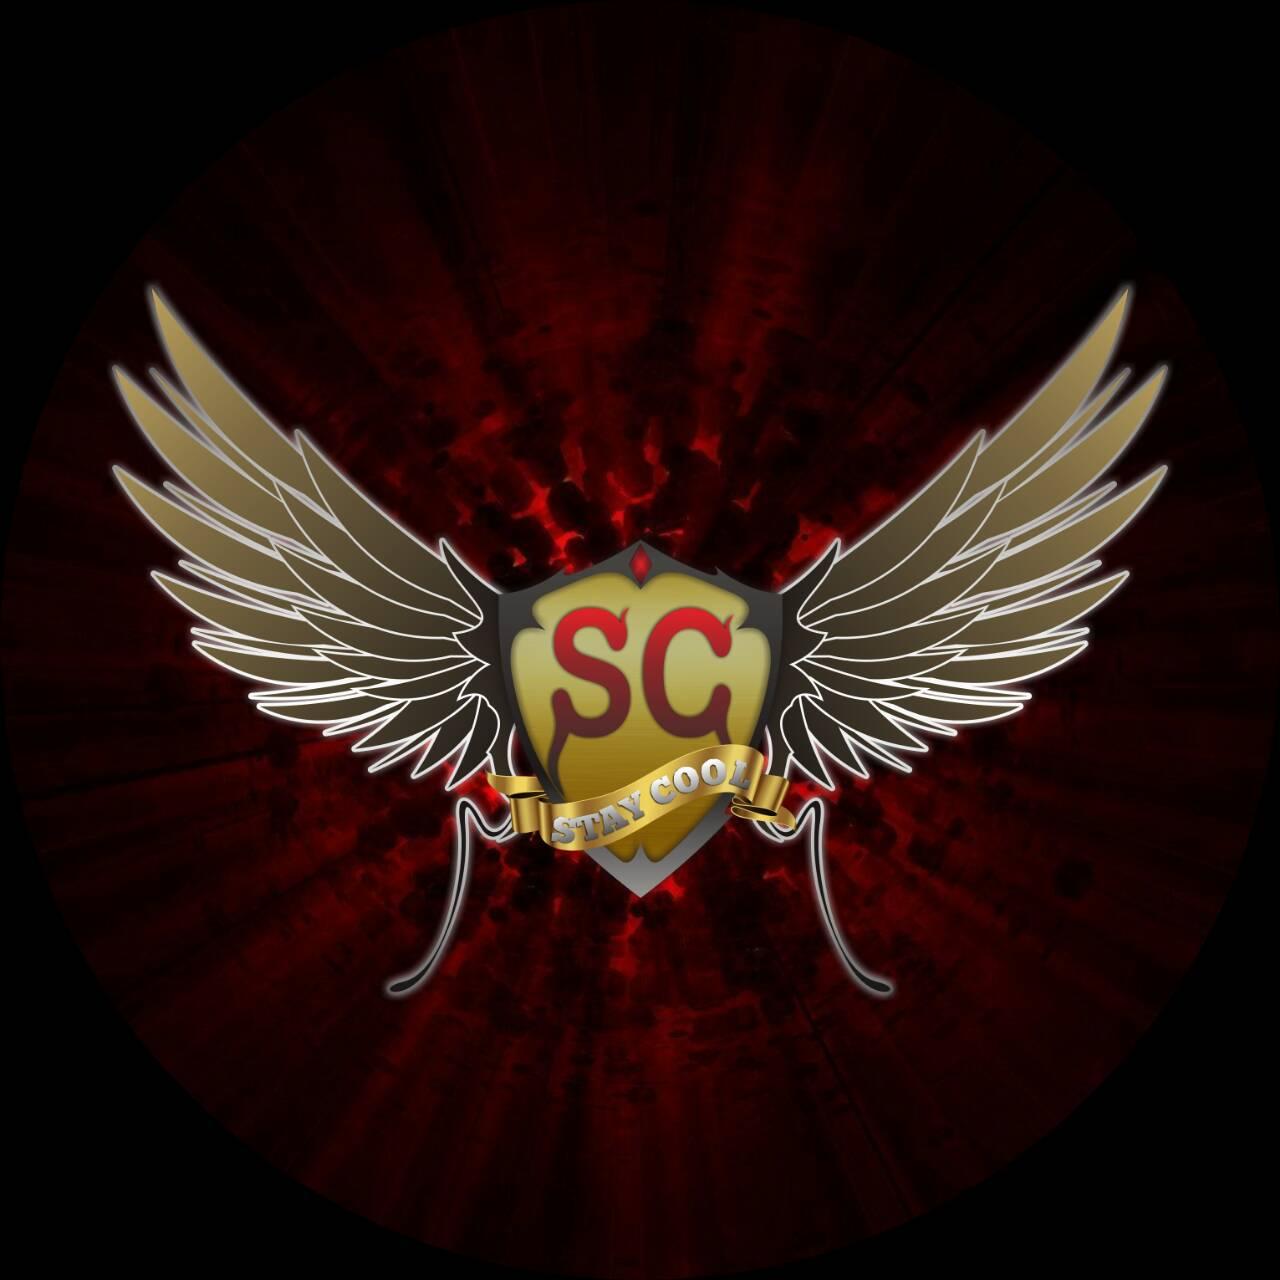 Squad Staycool Radio Indonesia II [SSRI Live]